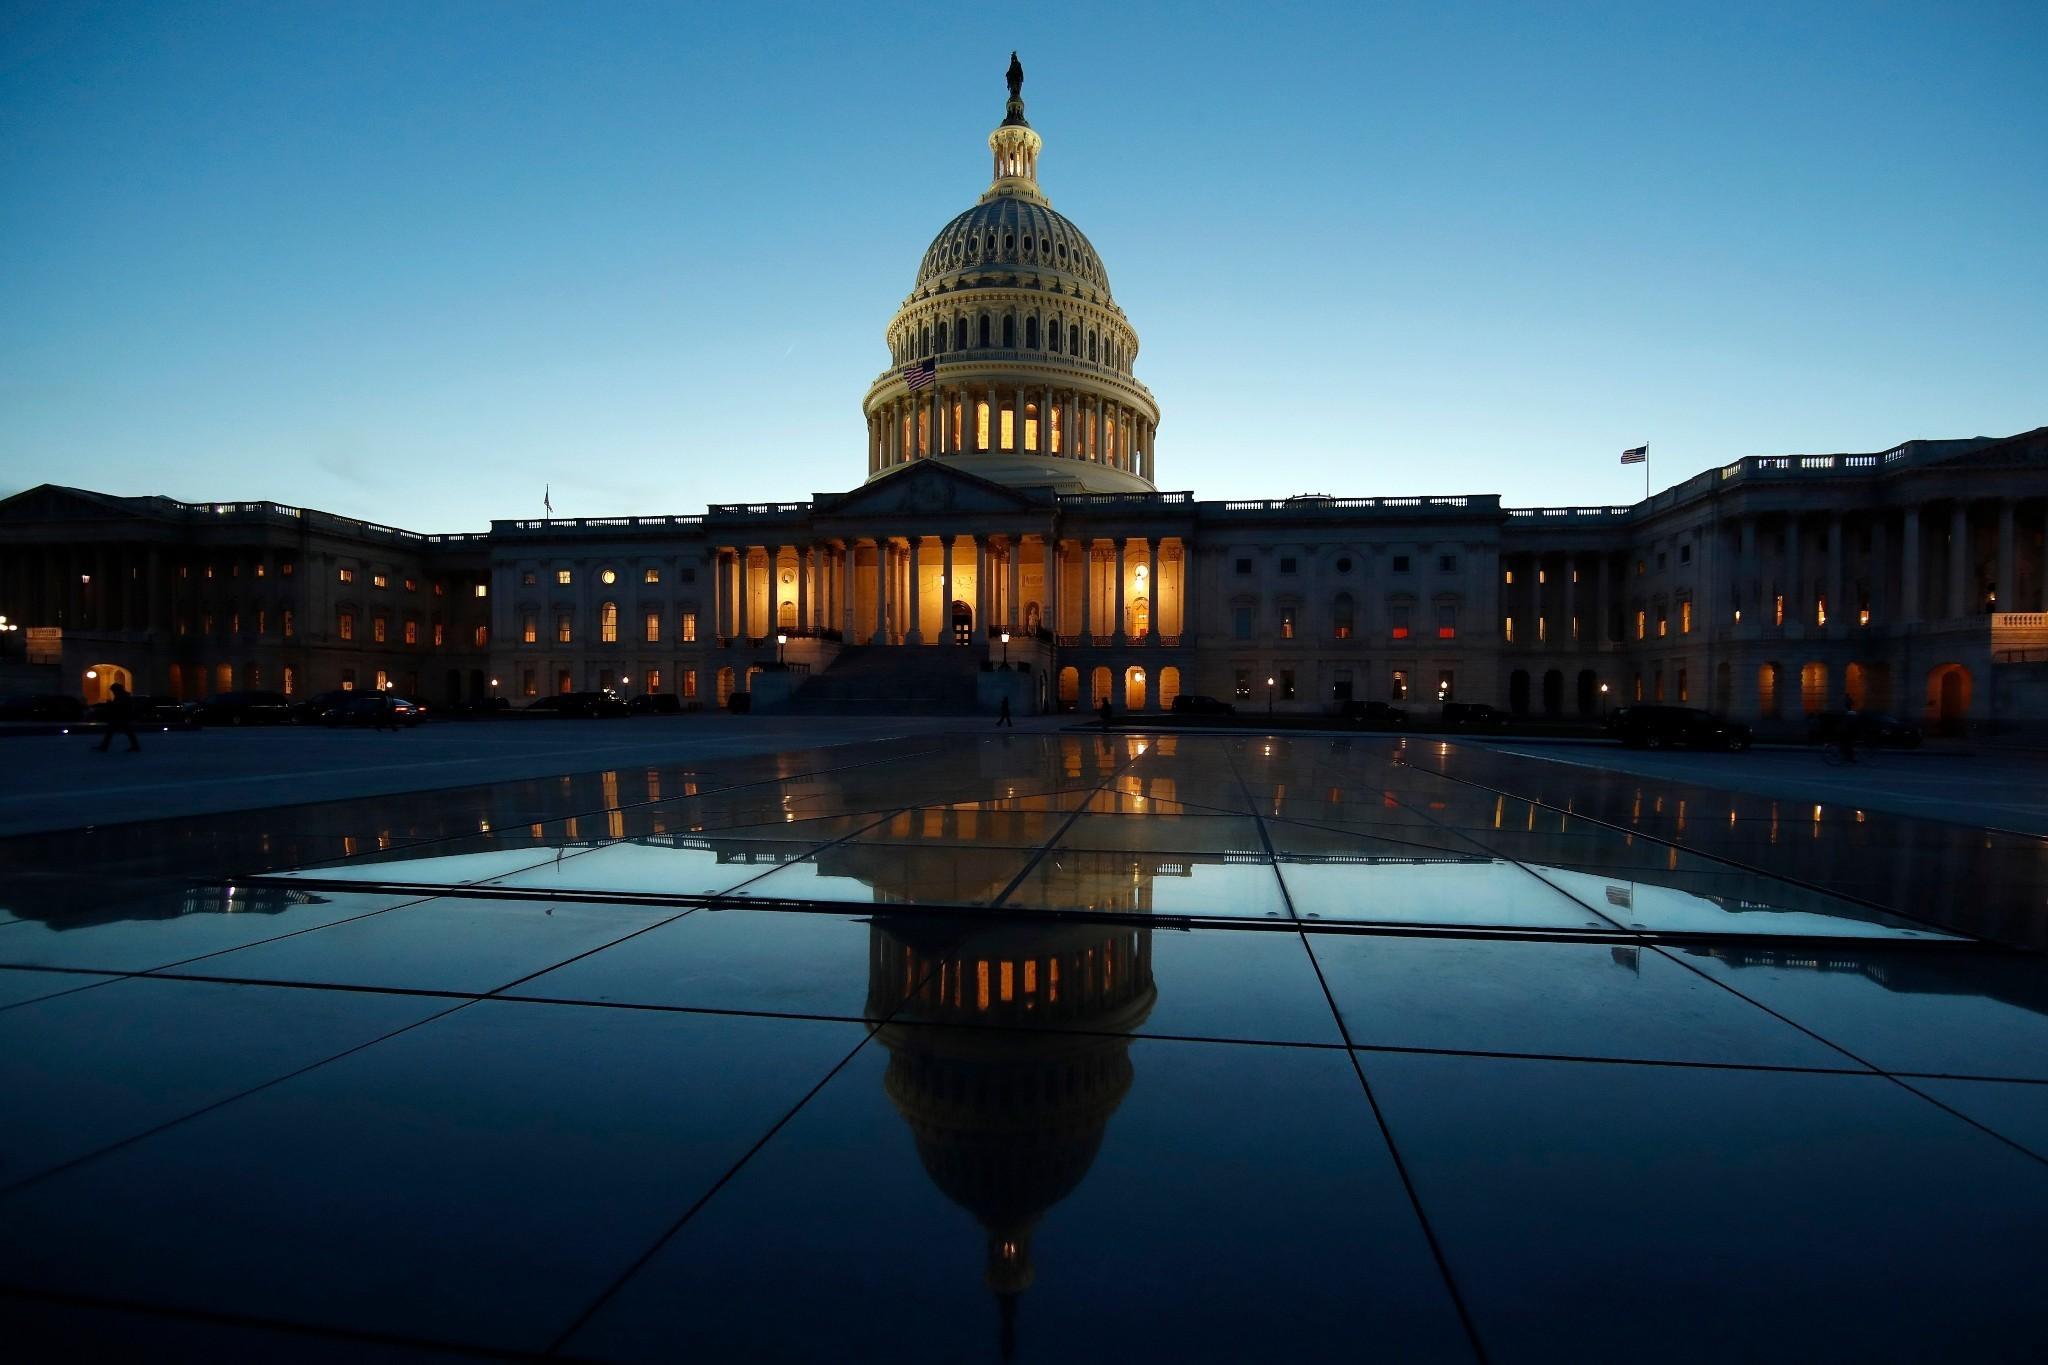 We are former senators. The Senate has long stood in defense of democracy — and must again.